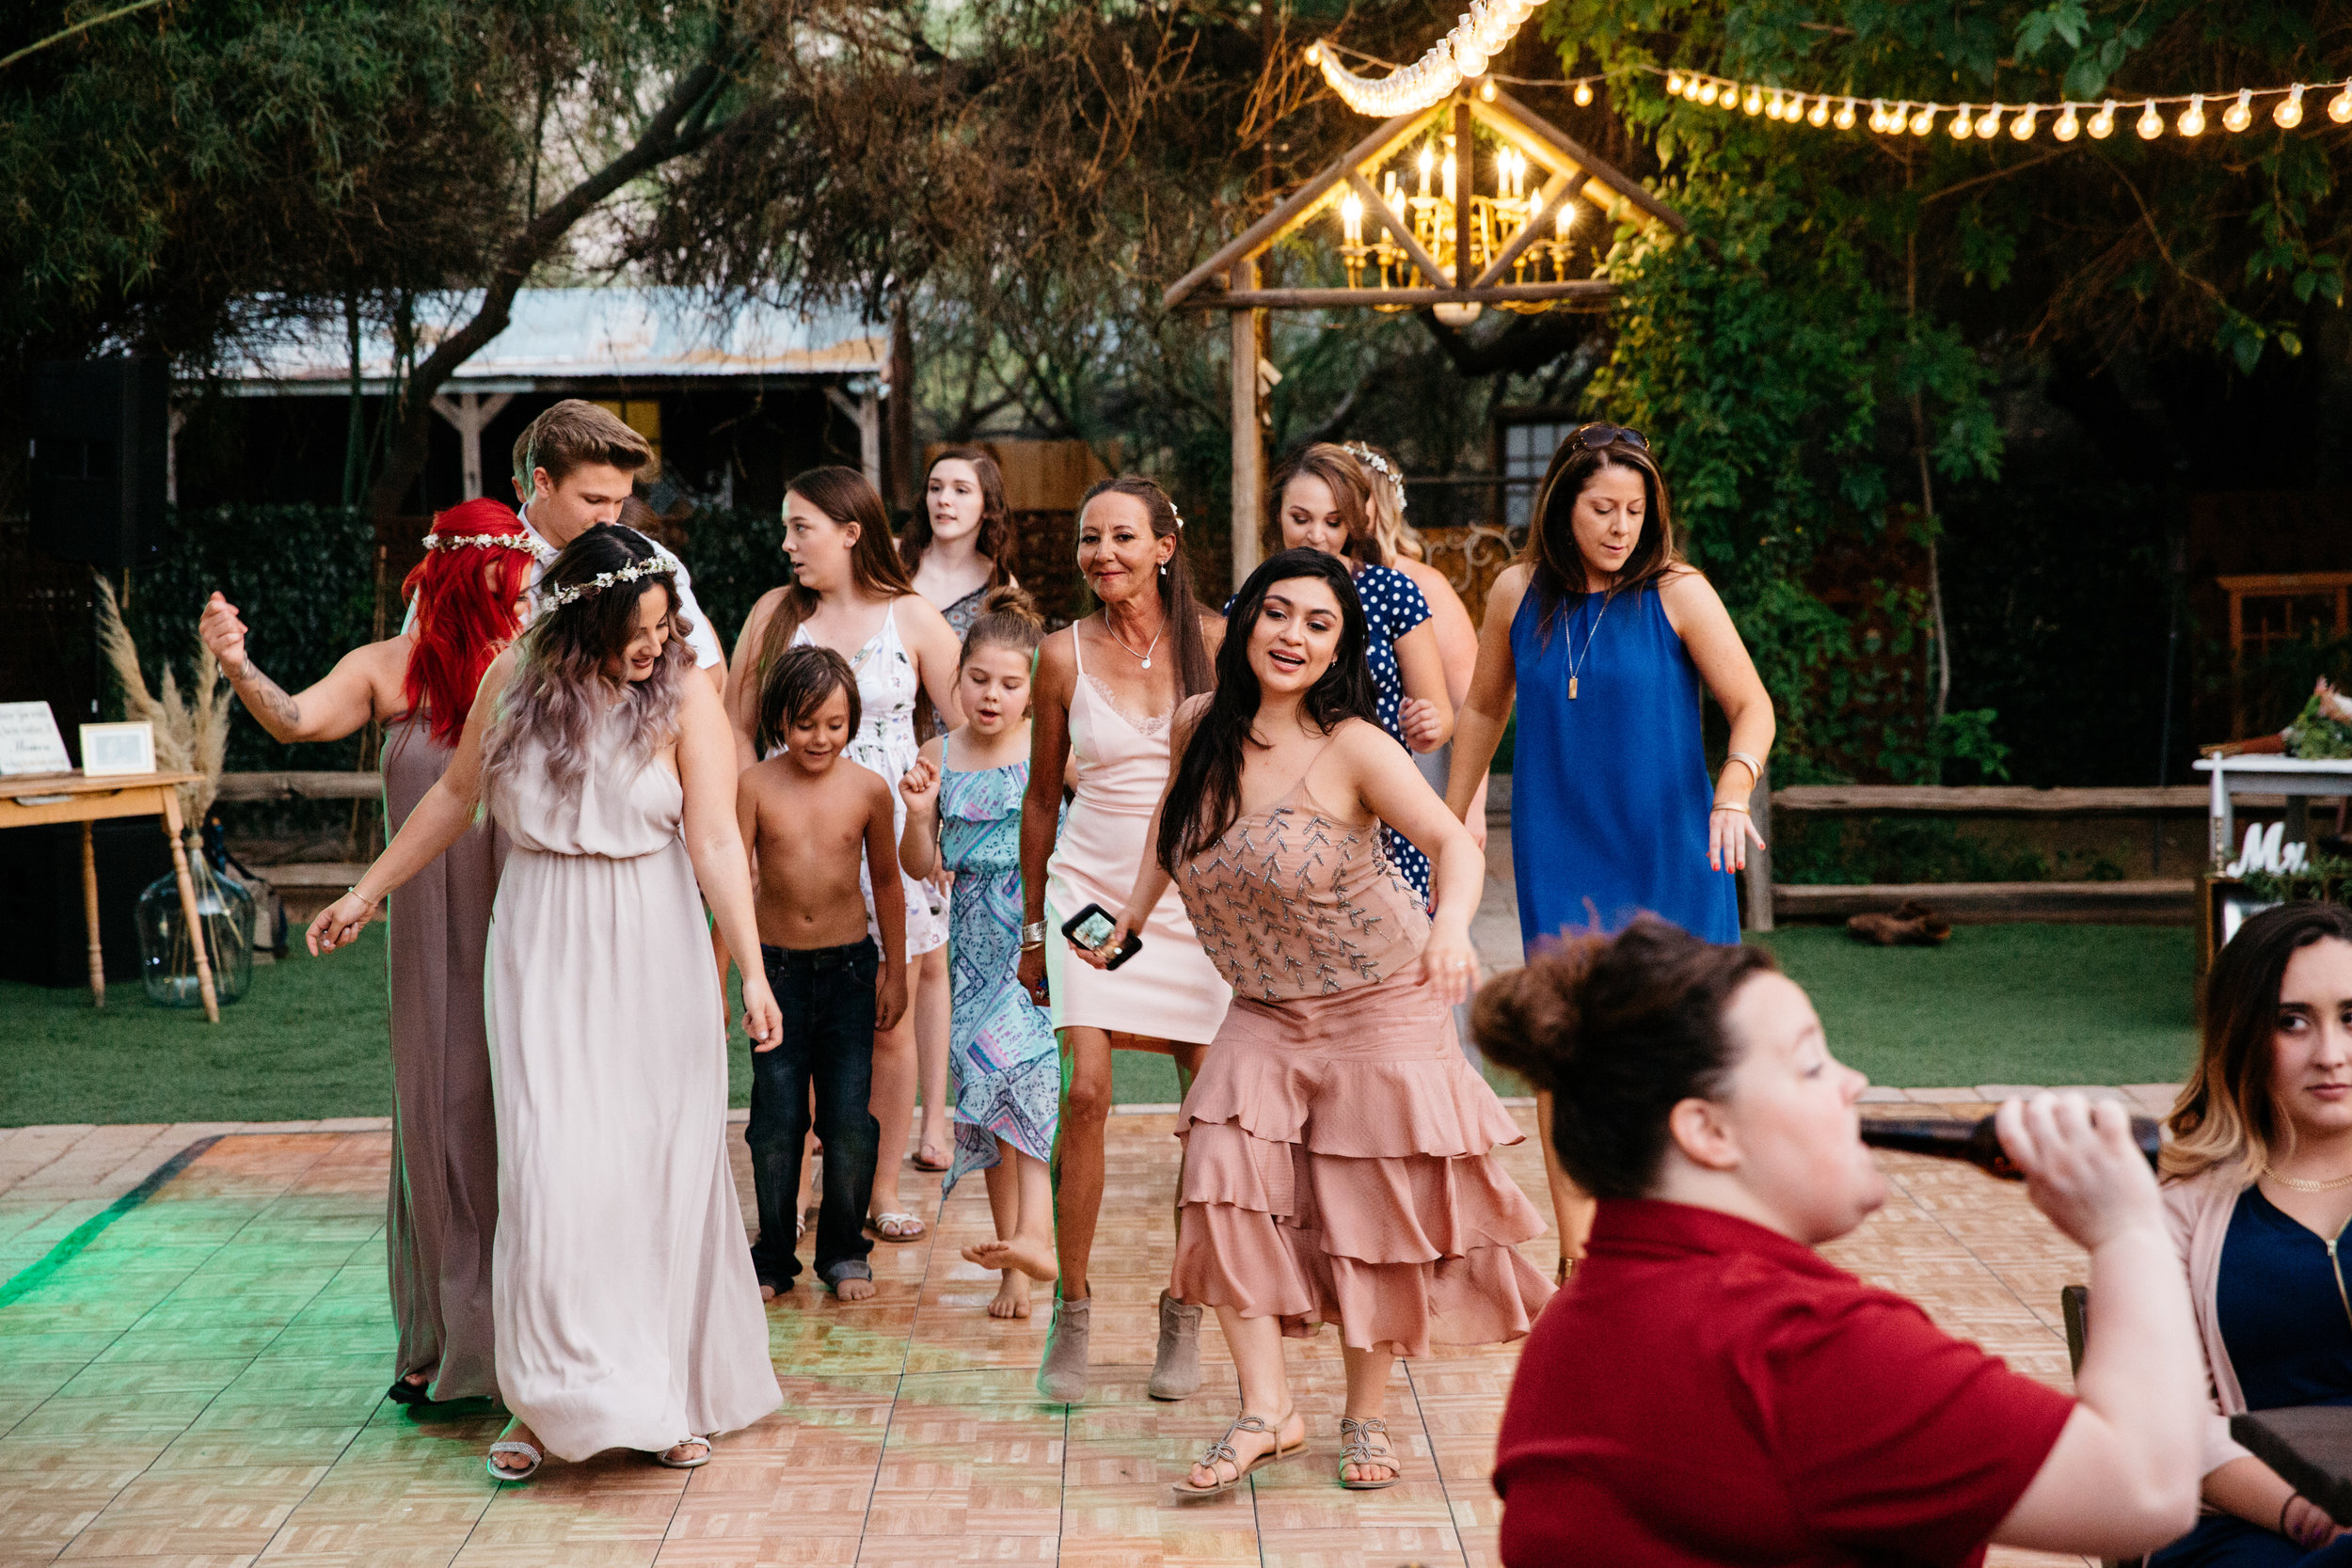 colorado-springs-wedding-photographer-44.jpg